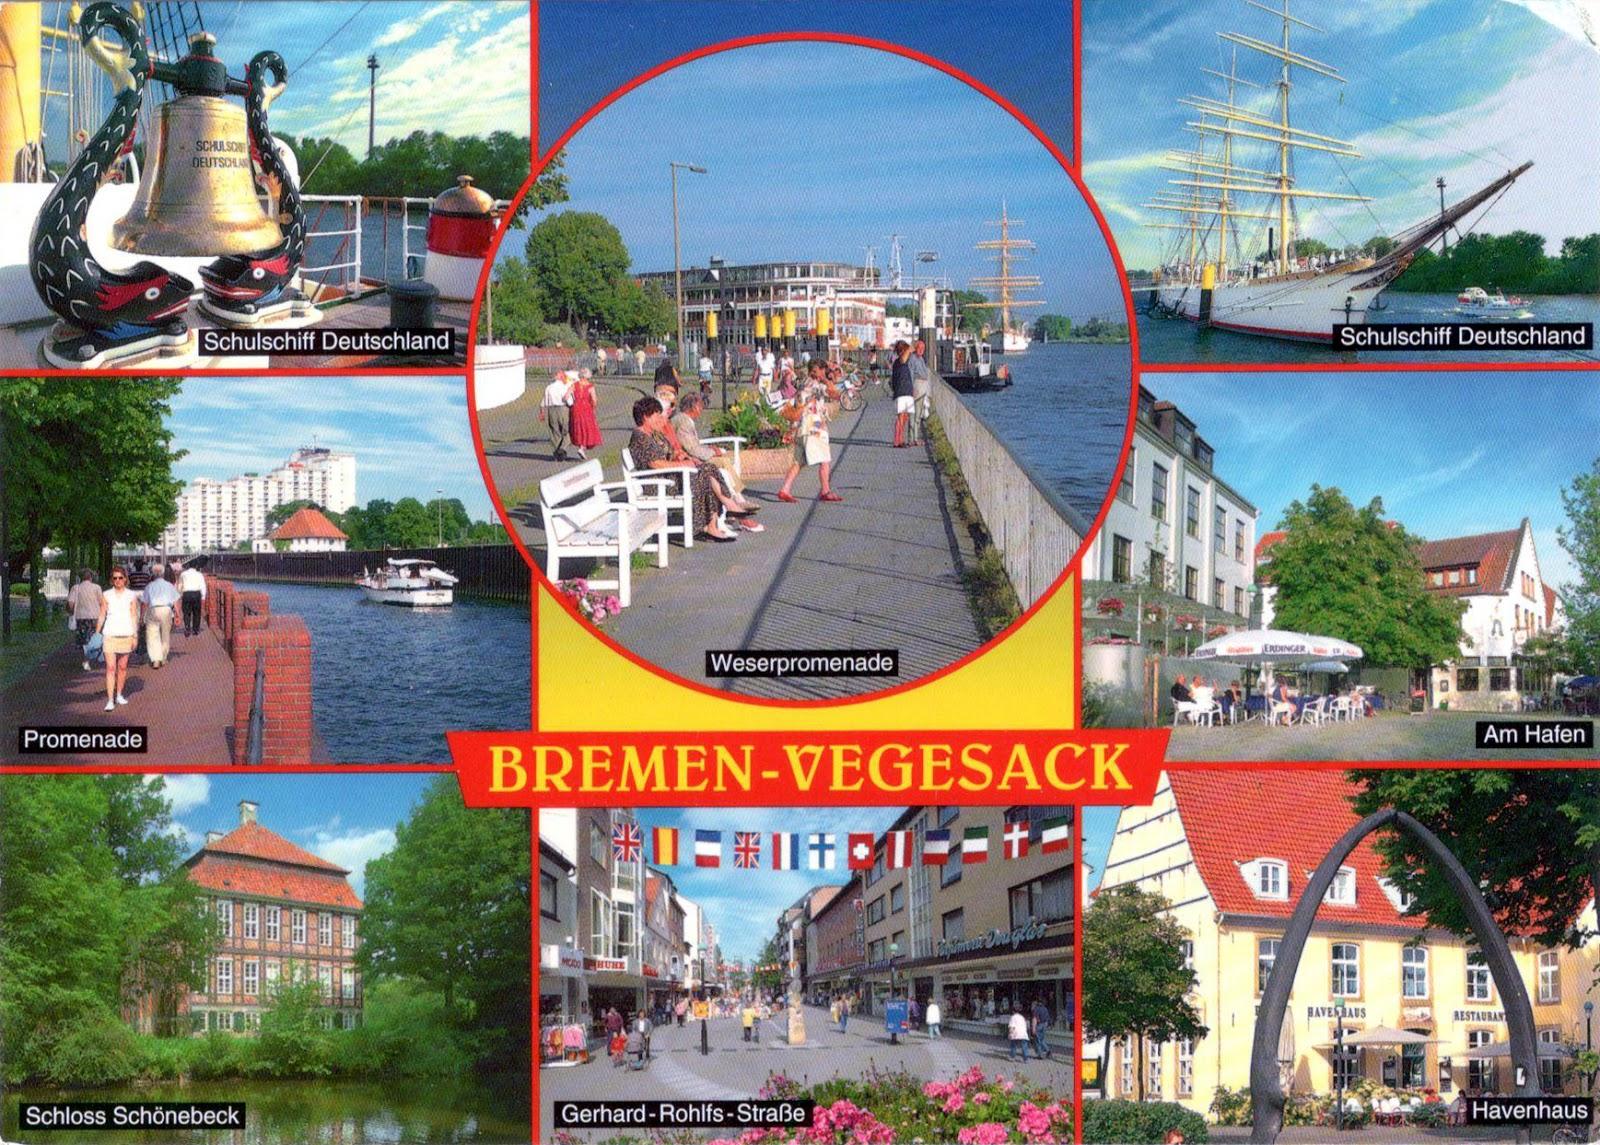 world come to my home 2115 germany bremen bremen vegesack. Black Bedroom Furniture Sets. Home Design Ideas